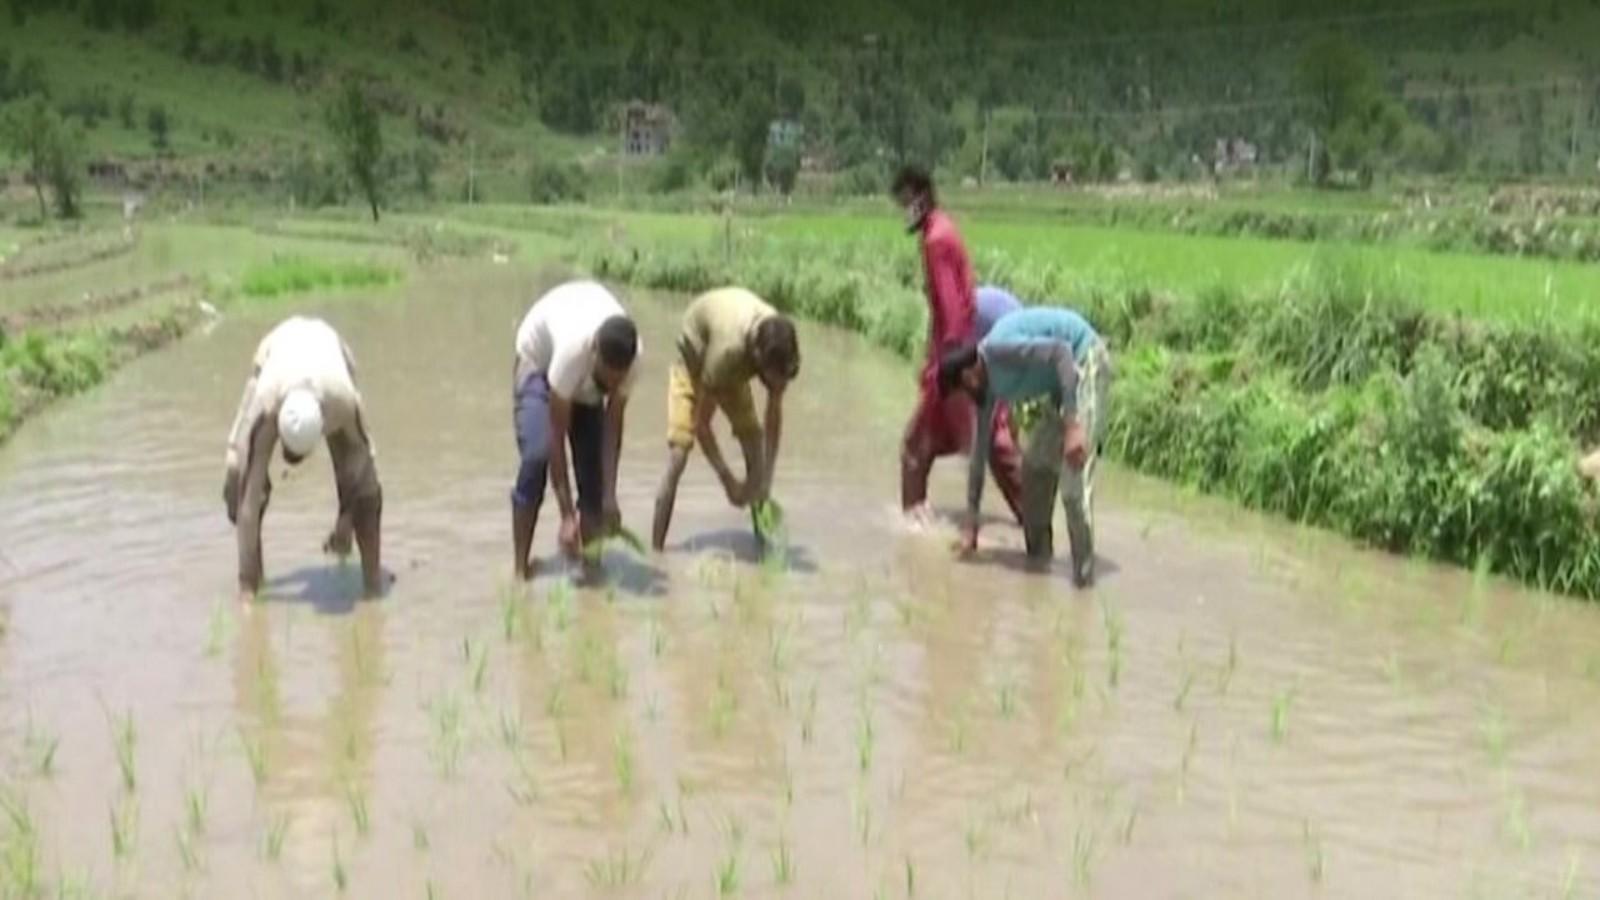 rajouri-farmers-rejoice-after-getting-water-supply-to-farm-fields